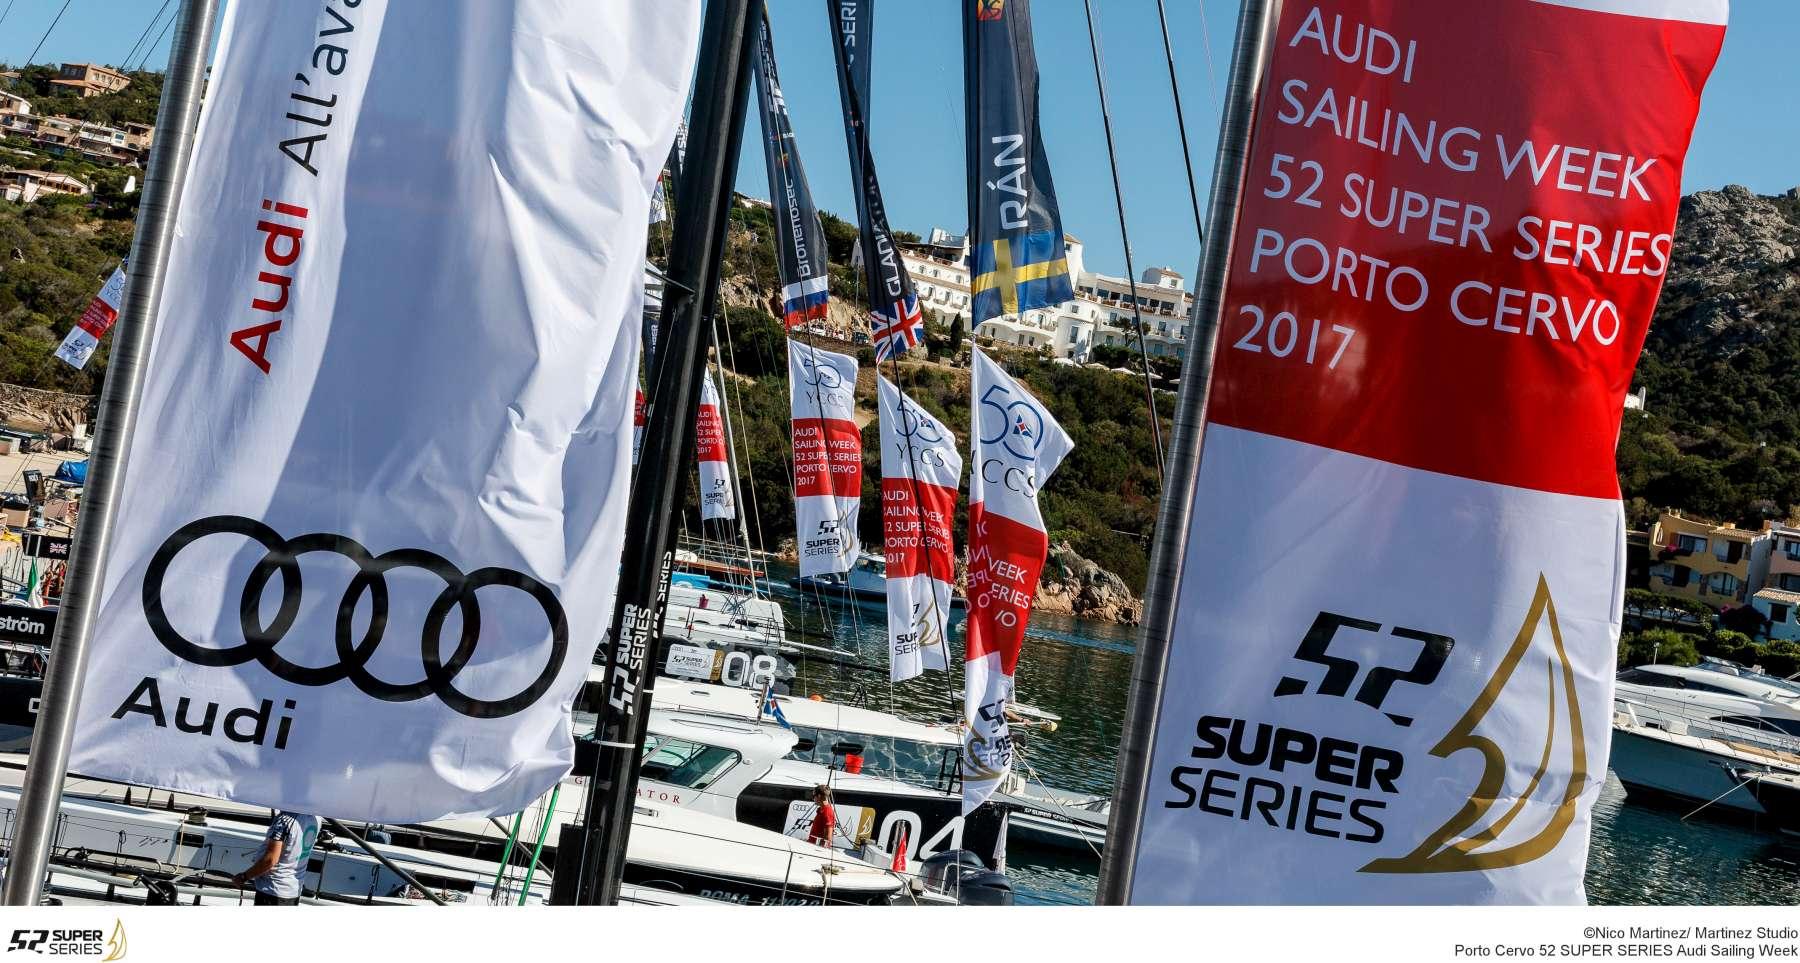 Audi Sailing Week - 52 Super Series  - Porto Cervo 2017